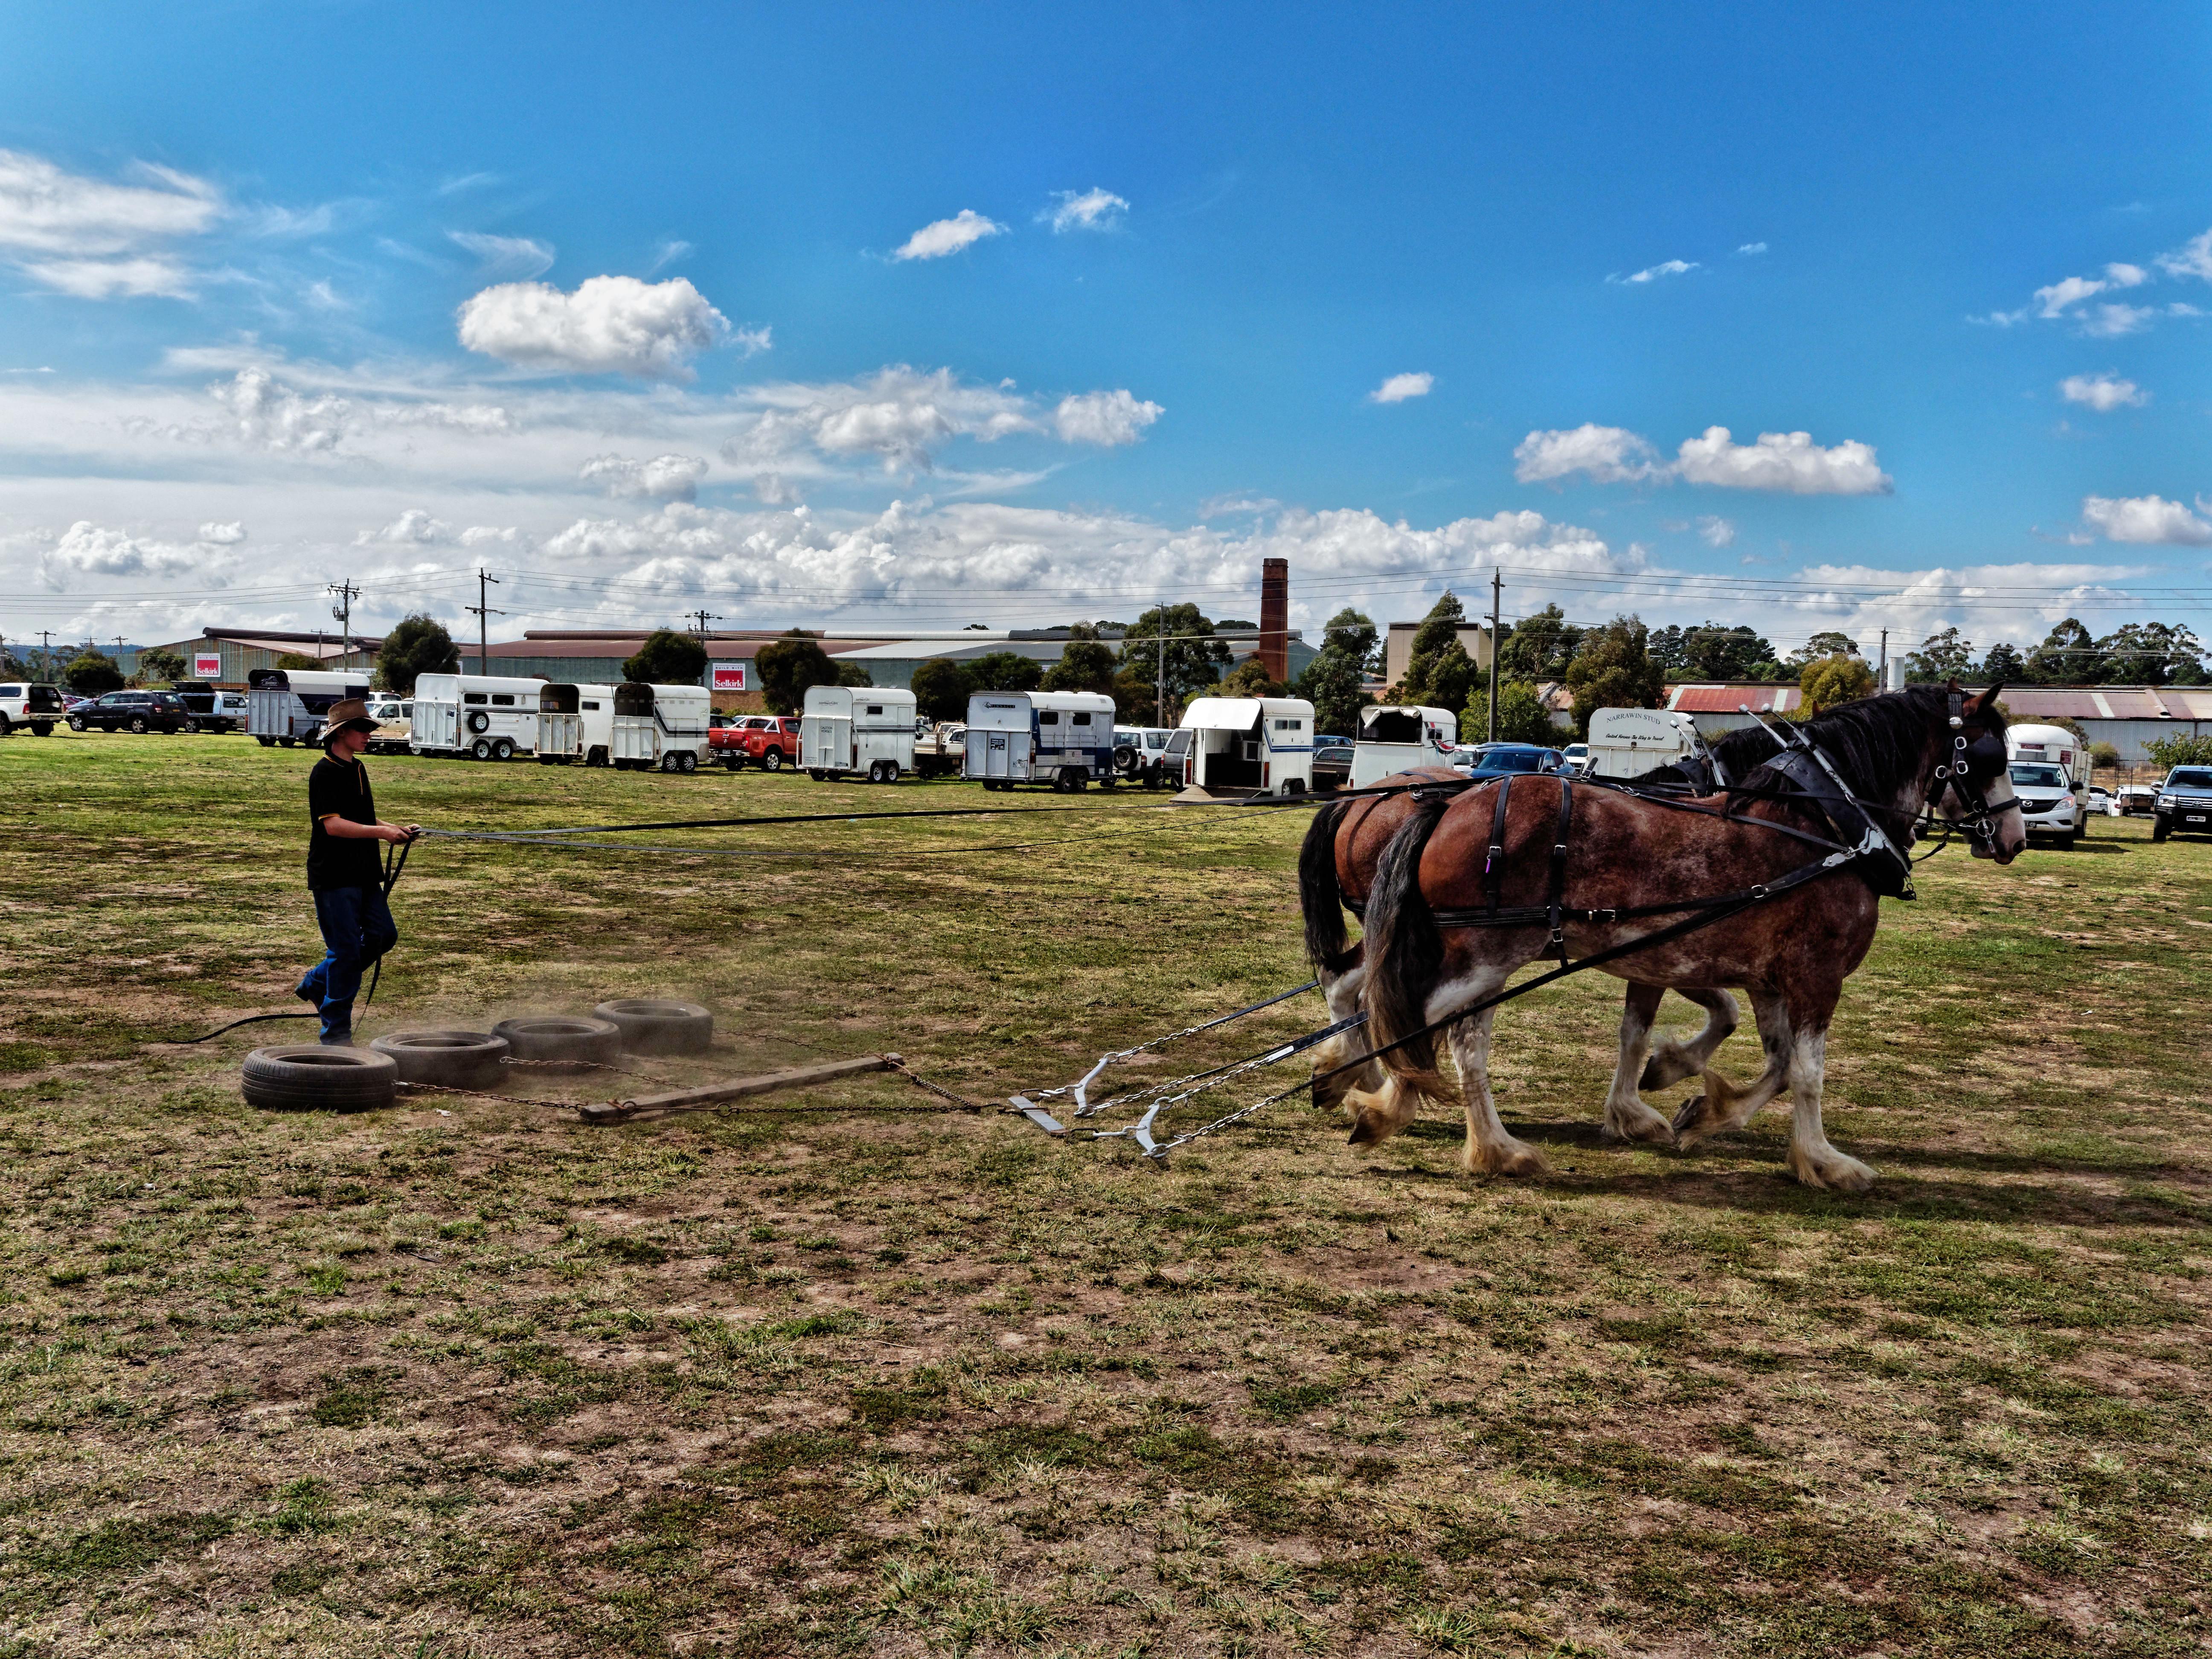 Rural-lifestyle-expo-38.jpeg